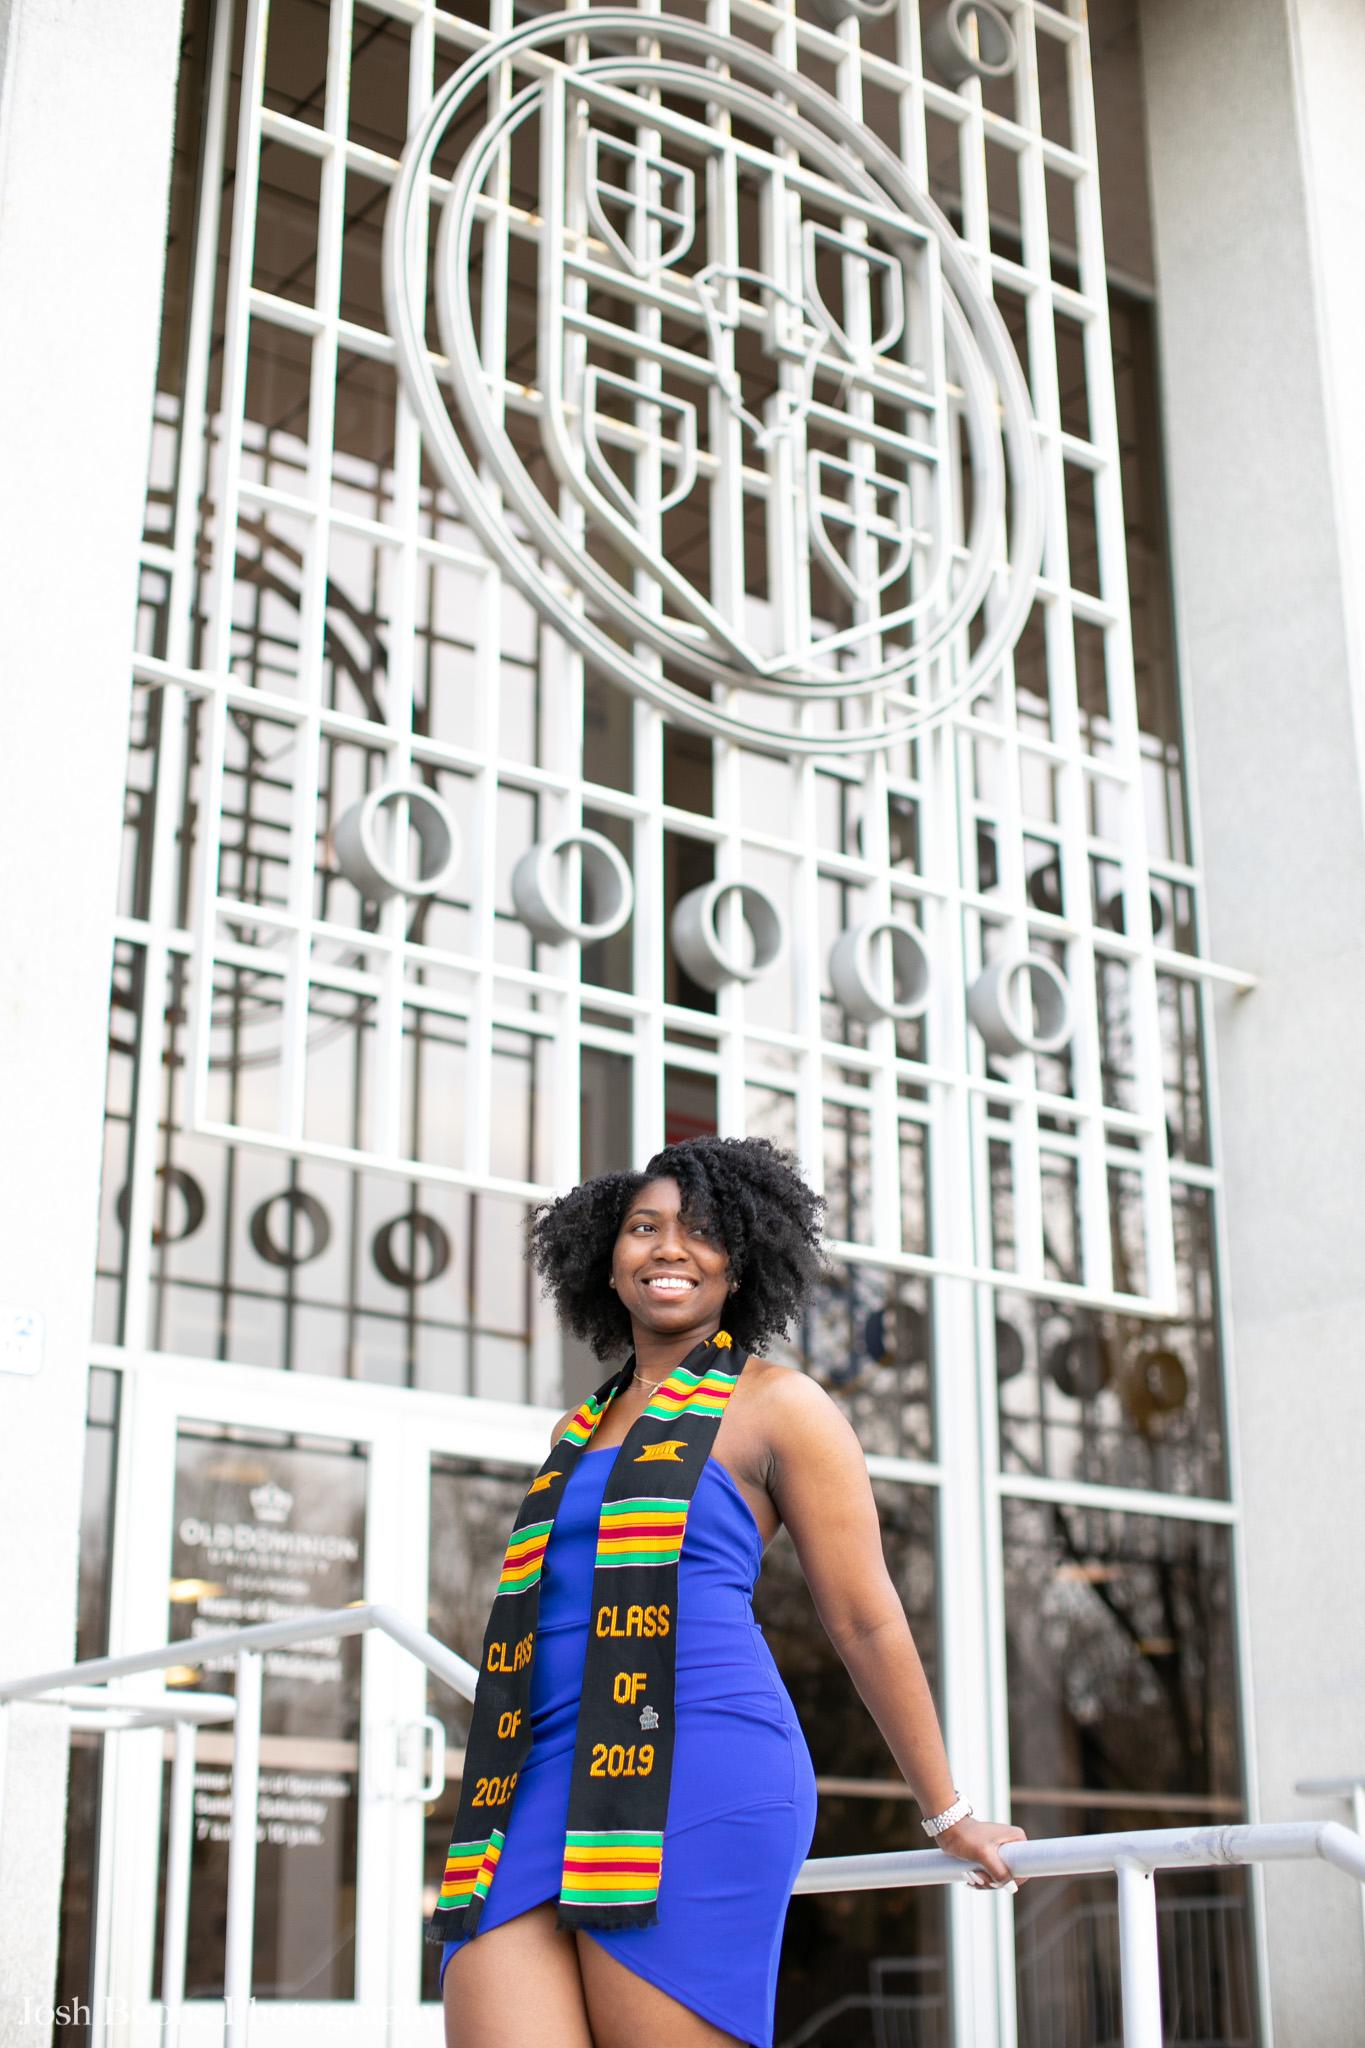 old_dominion_university_graduation_pictures-4.jpg